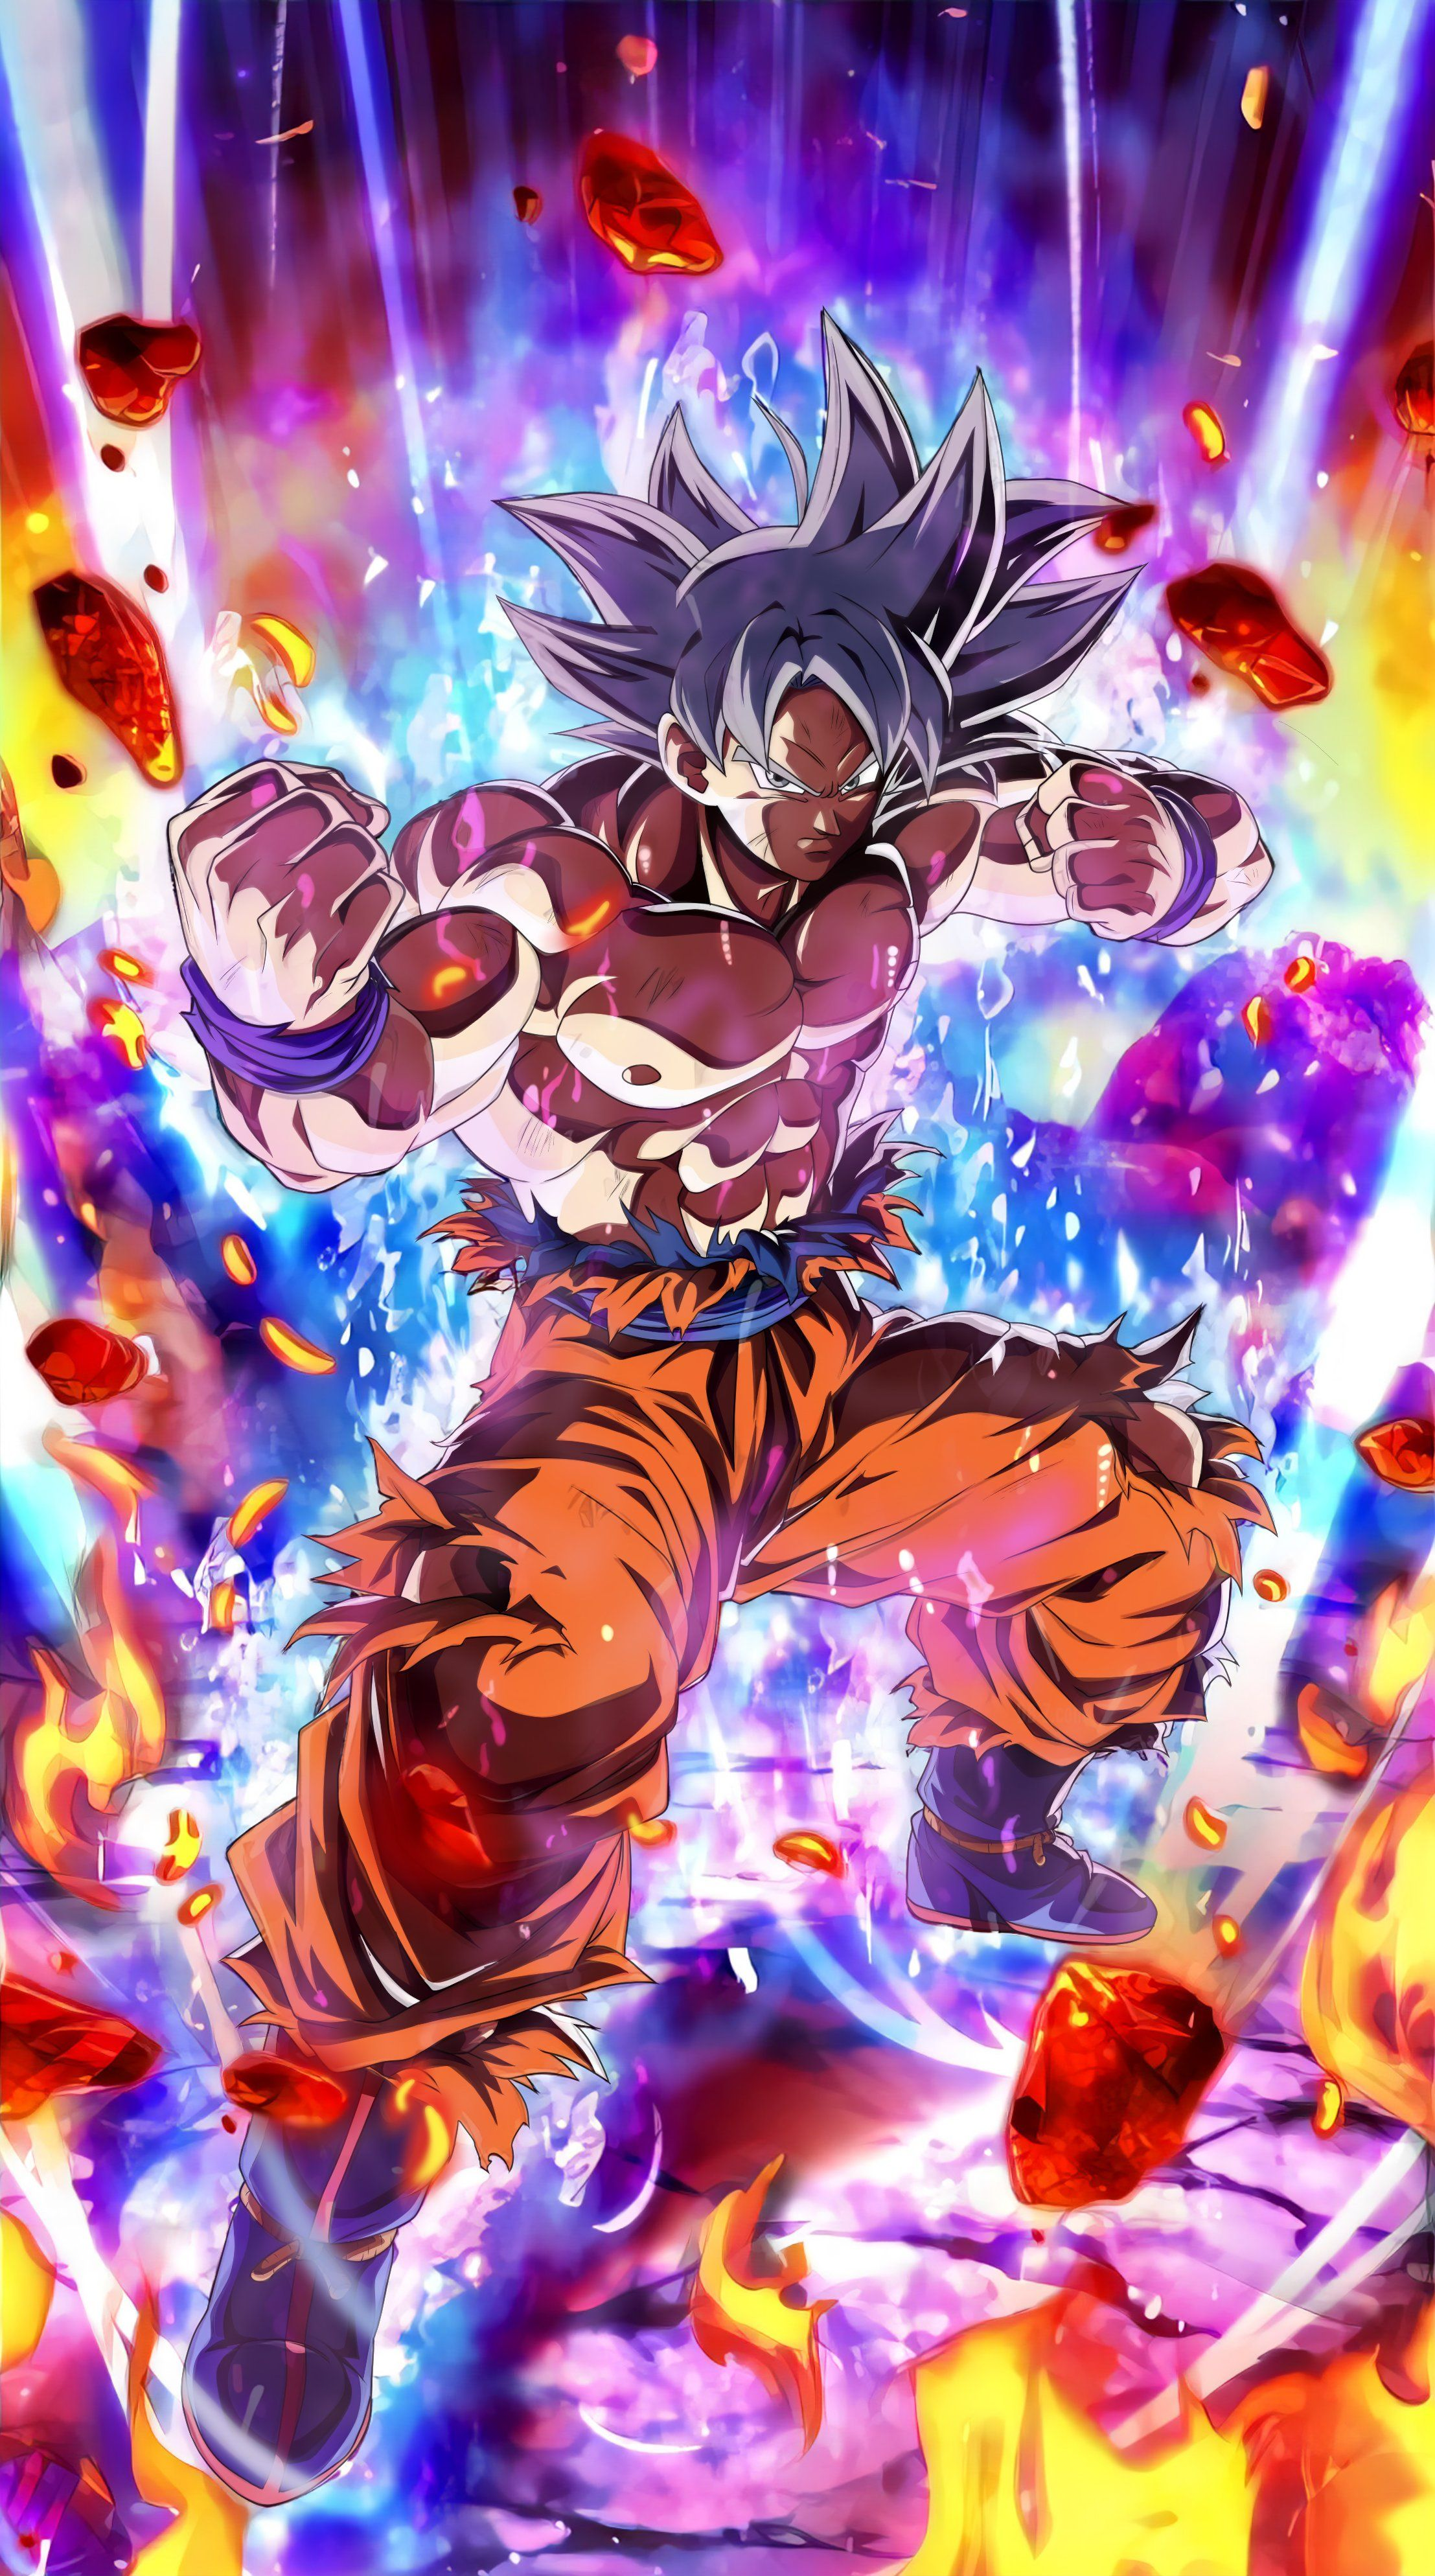 Lr Mastered Ultra Instinct Goku True Hd In 2021 Dragon Ball Super Artwork Anime Dragon Ball Super Dragon Ball Tattoo